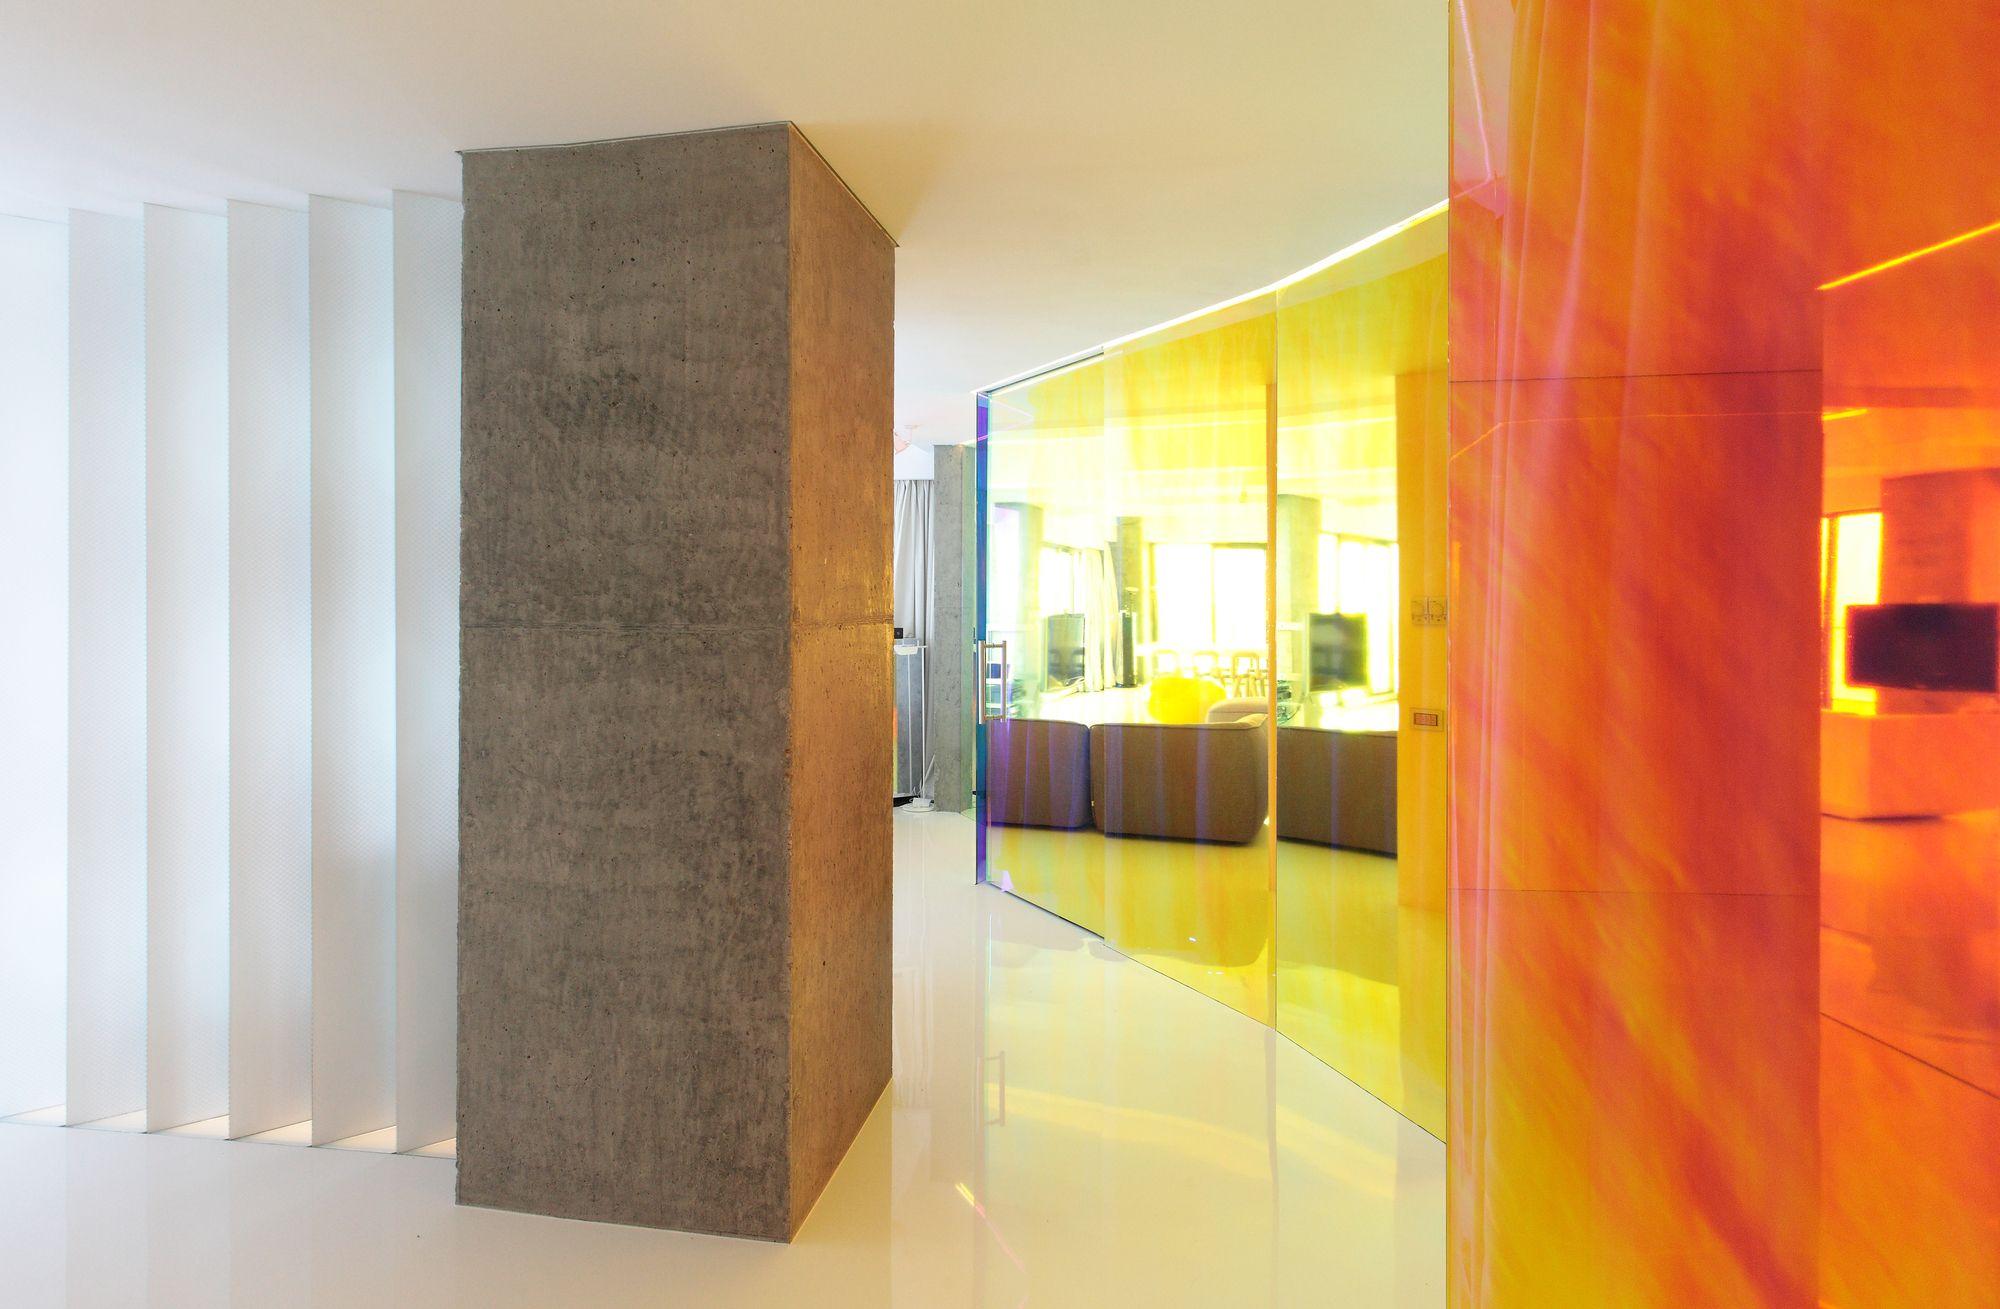 Unique Wall Glass Design Elaboration - Art & Wall Decor - hecatalog.info